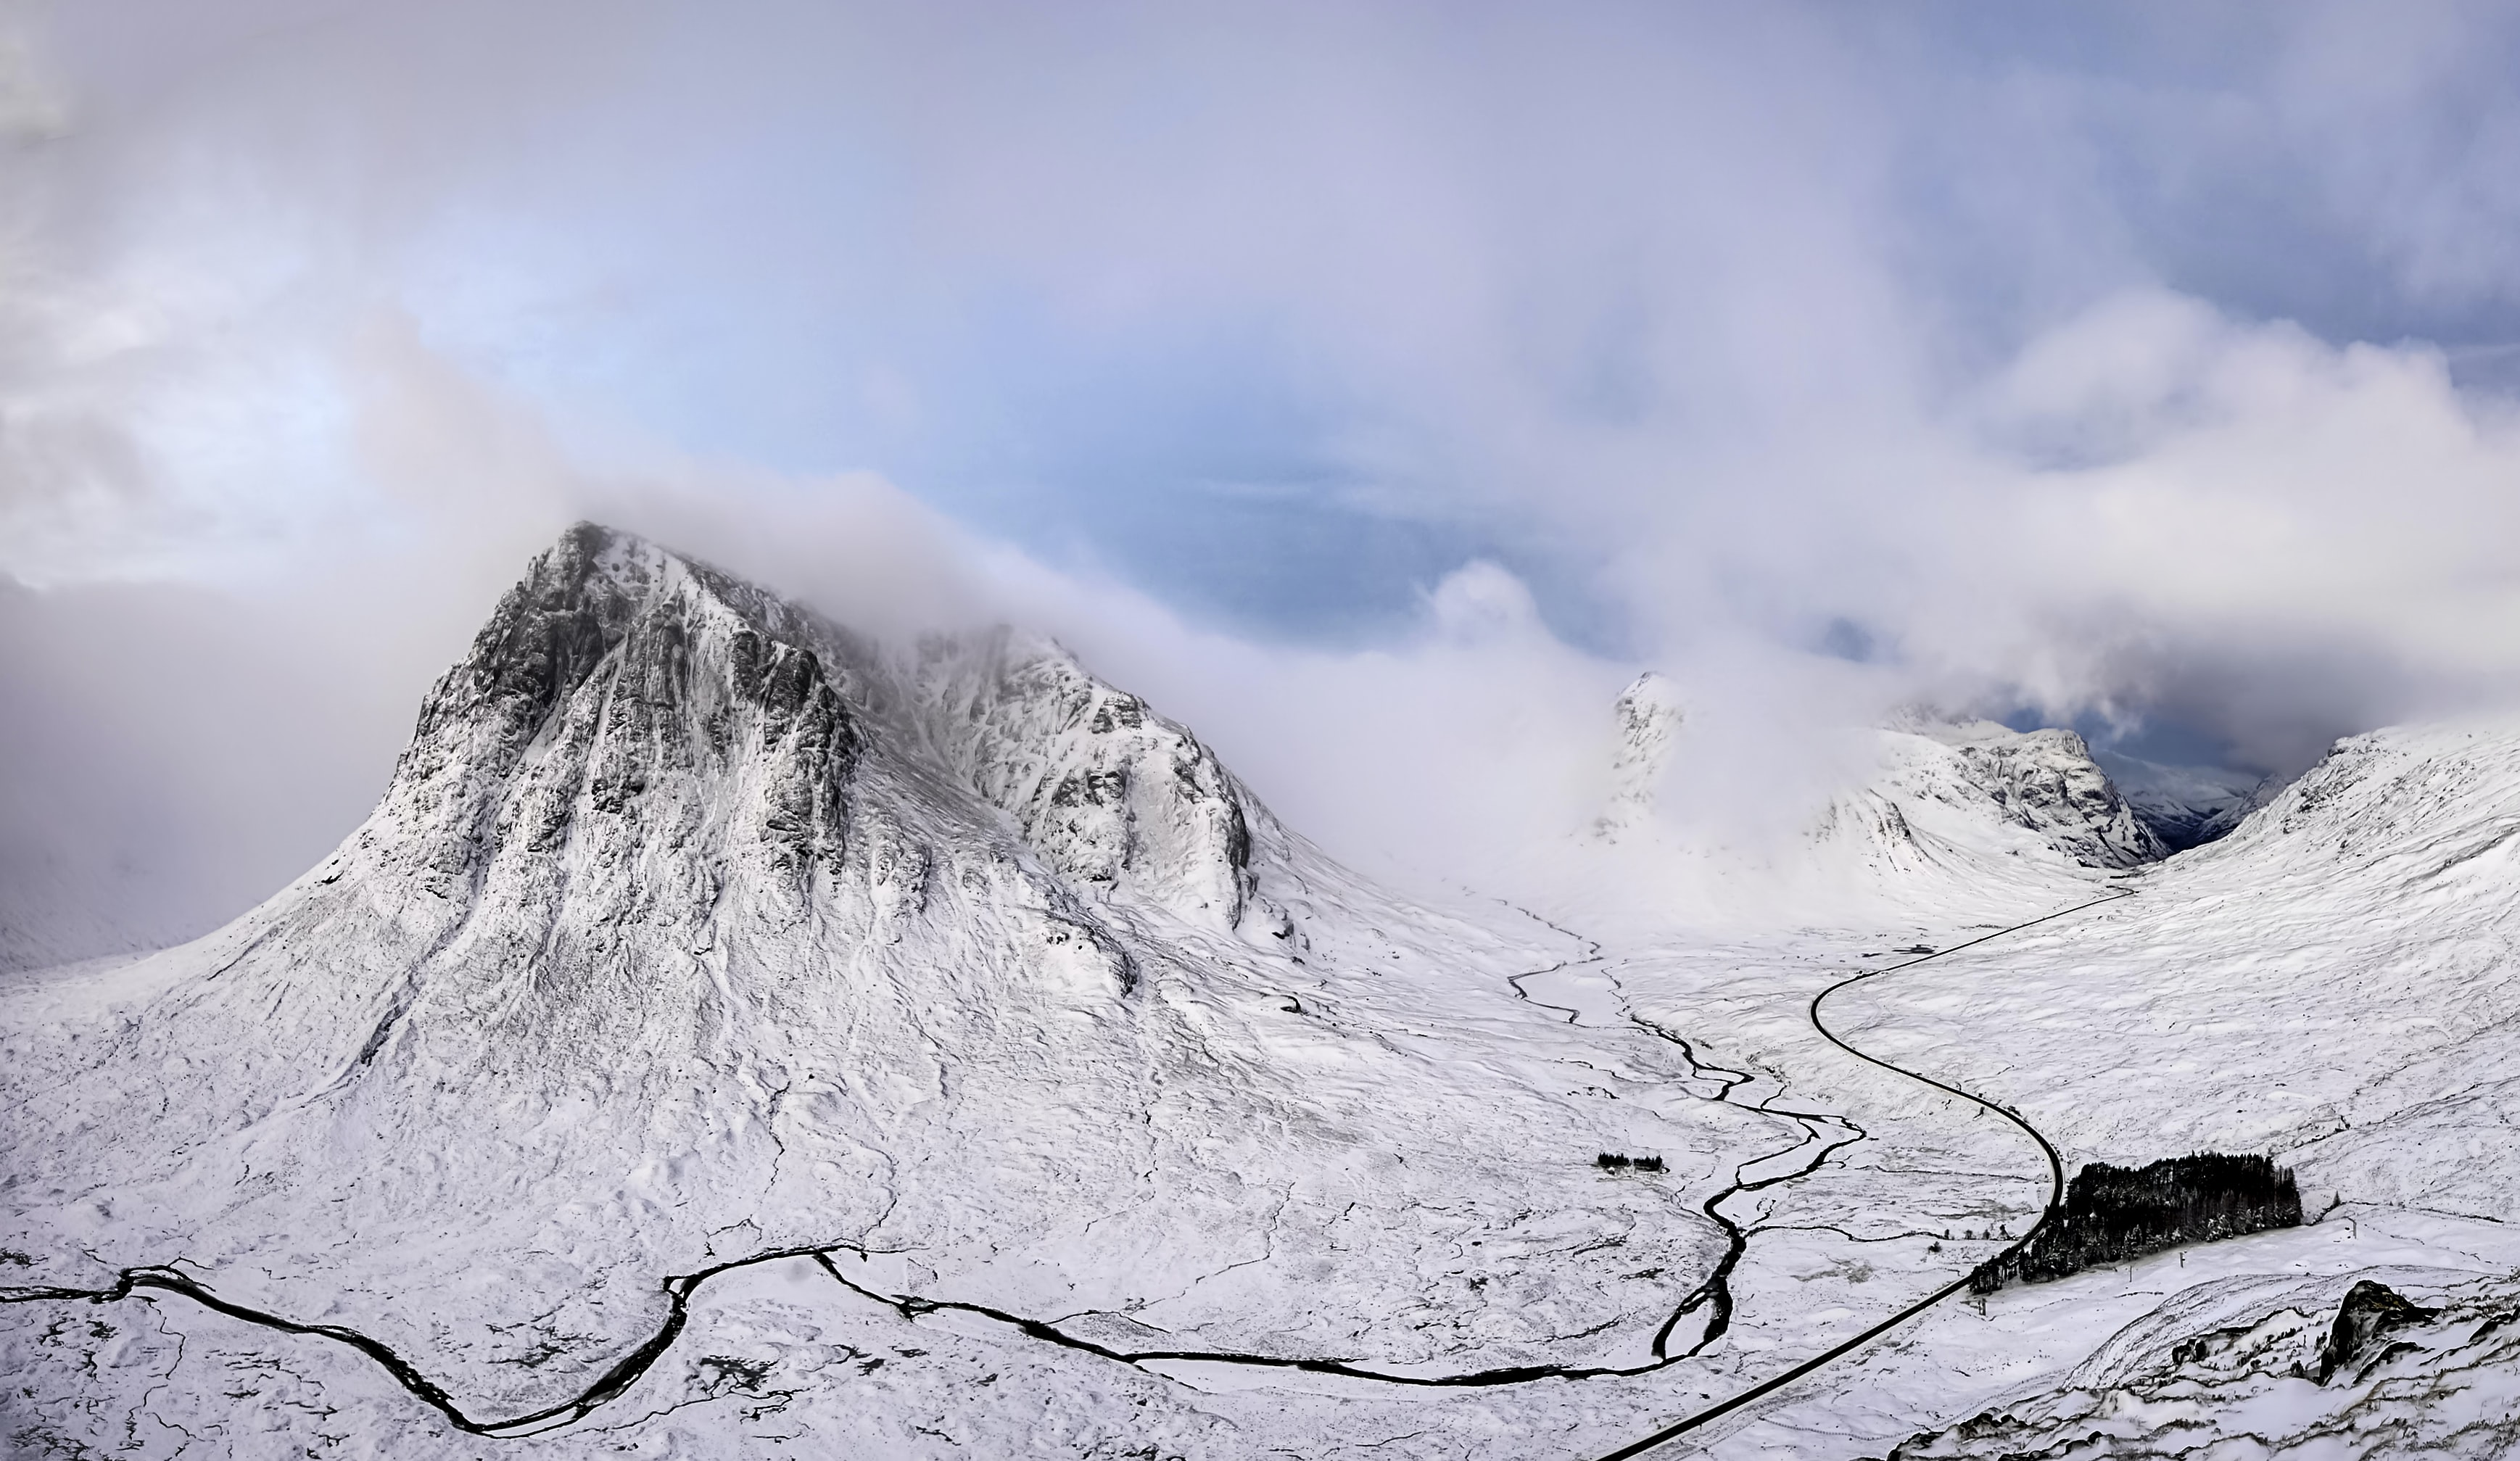 A snowy mountain valley in Glencoe